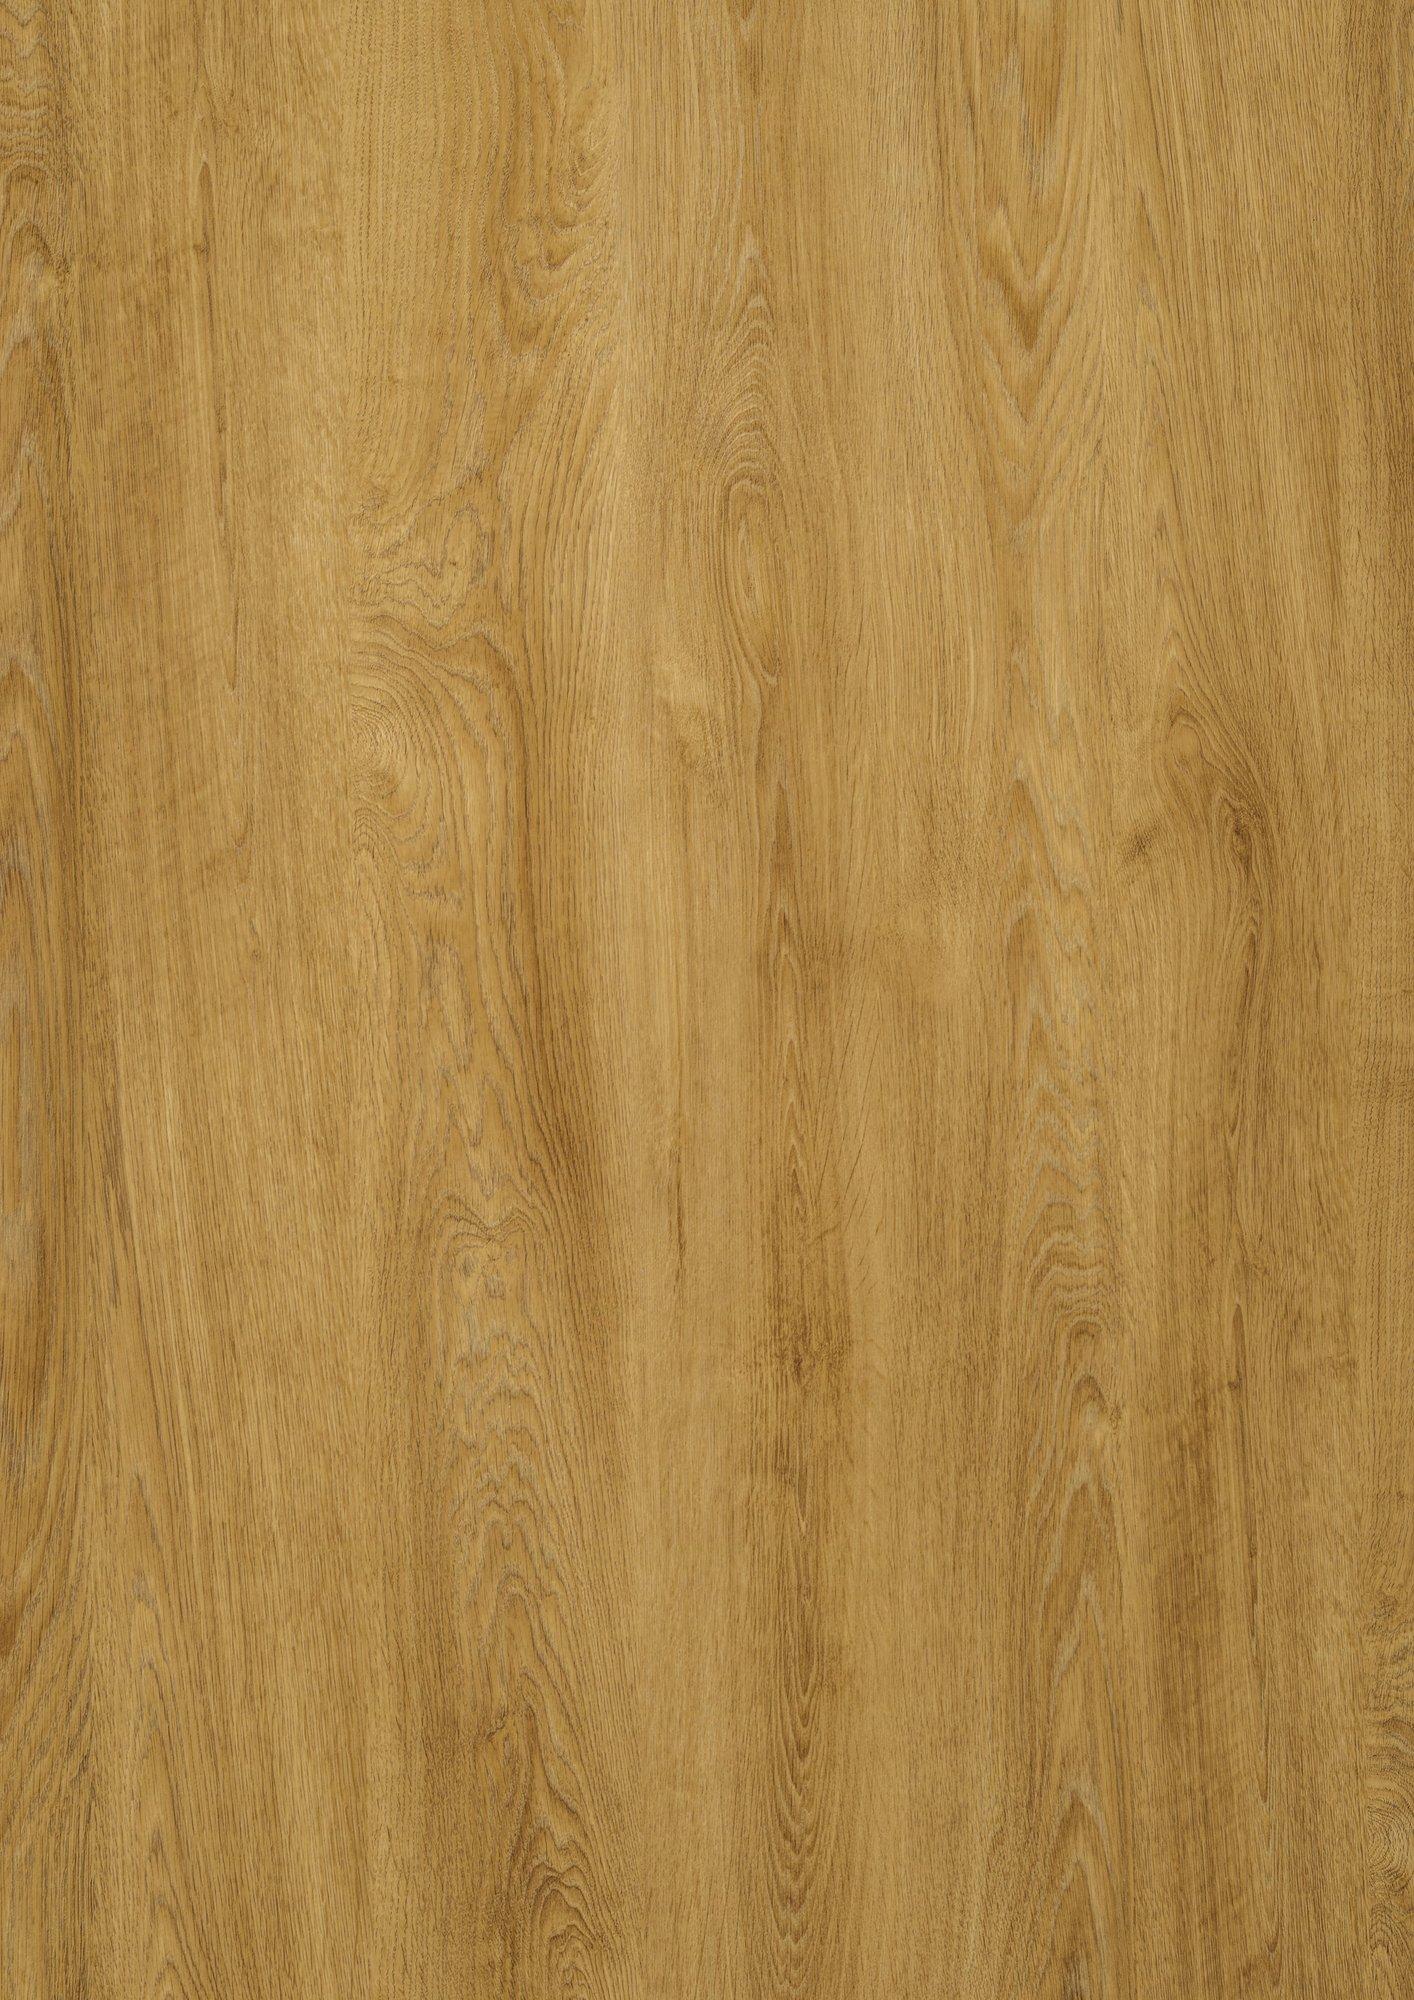 KALEODO WOODEC - Turner Oak malt